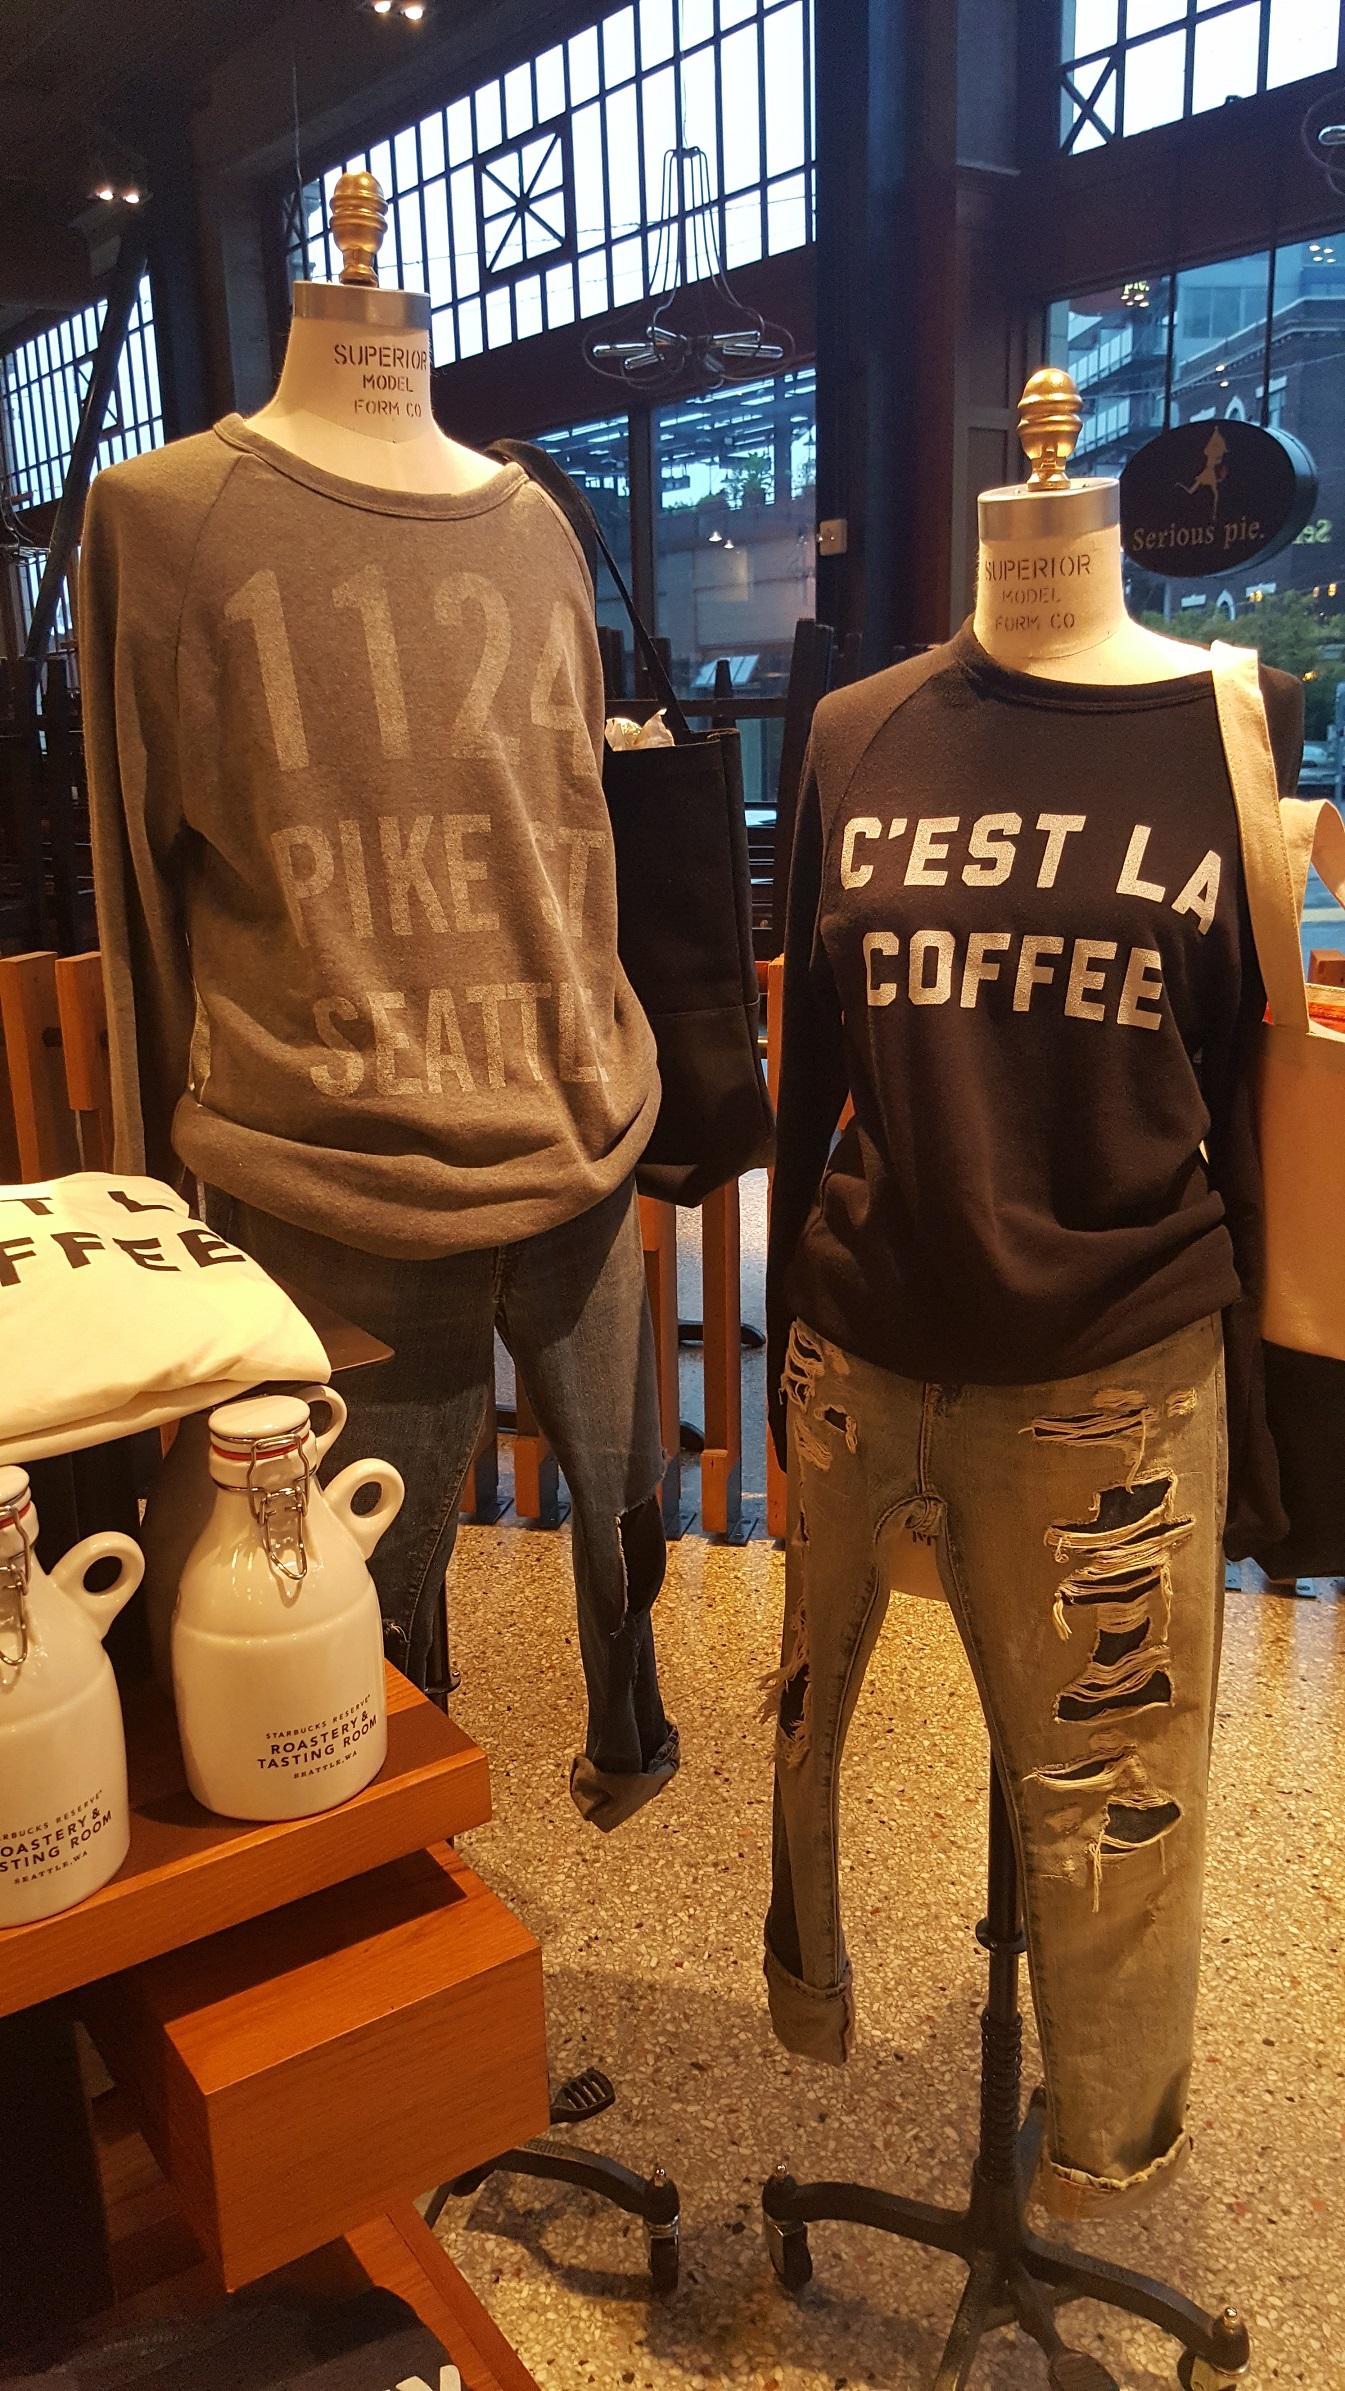 20160917_071348 the models with 2 sweatshirts.jpg